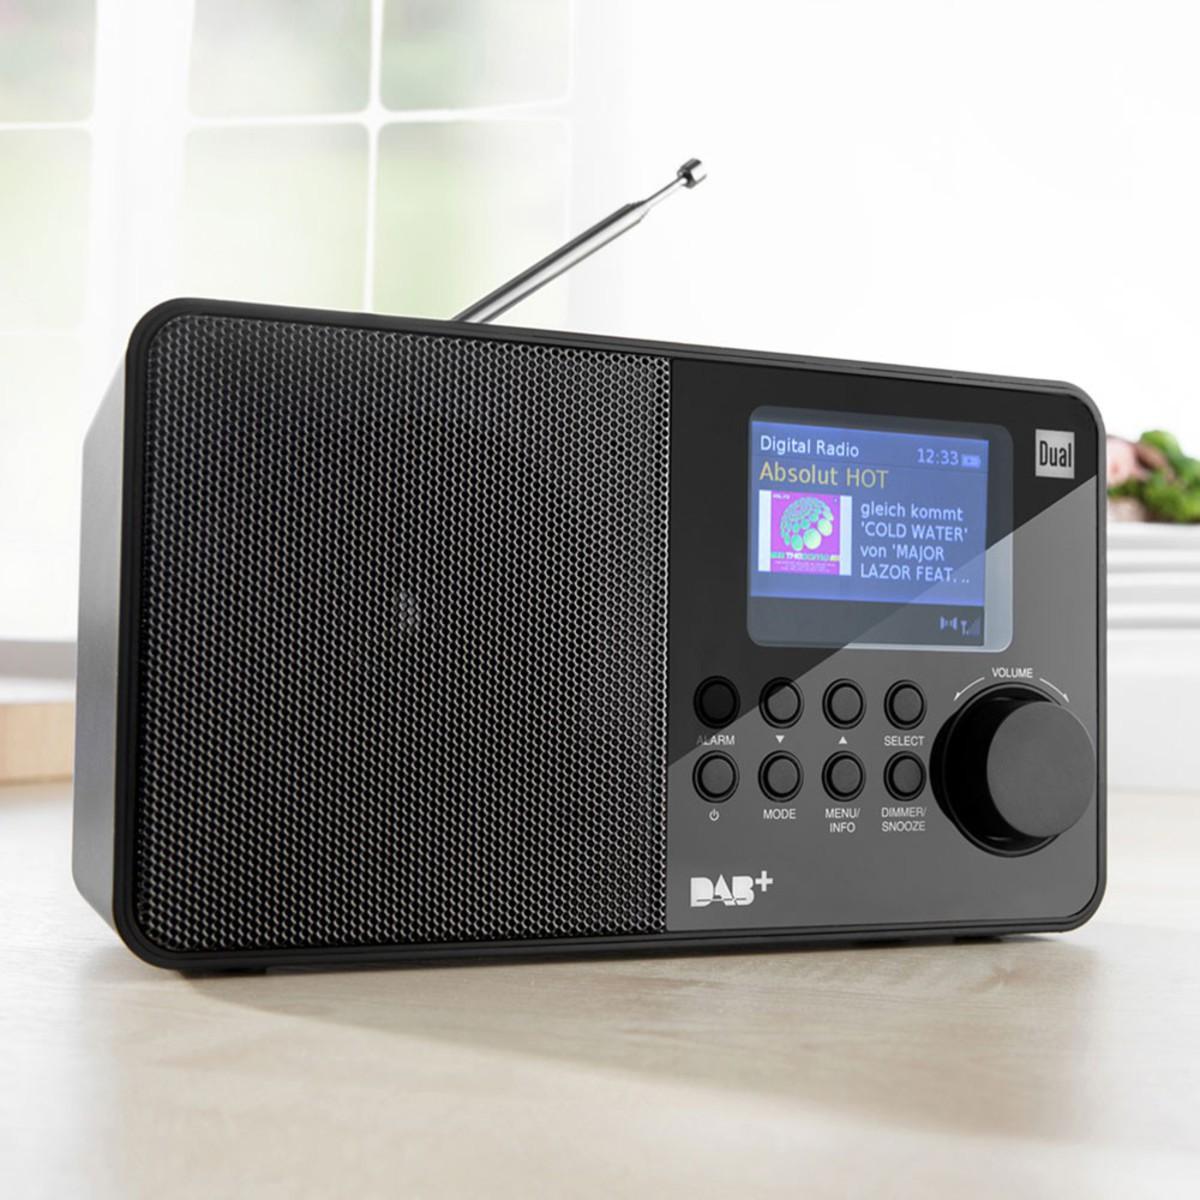 Bild 1 von DUAL Portables DAB+/ UKW-Radio DAB 18C